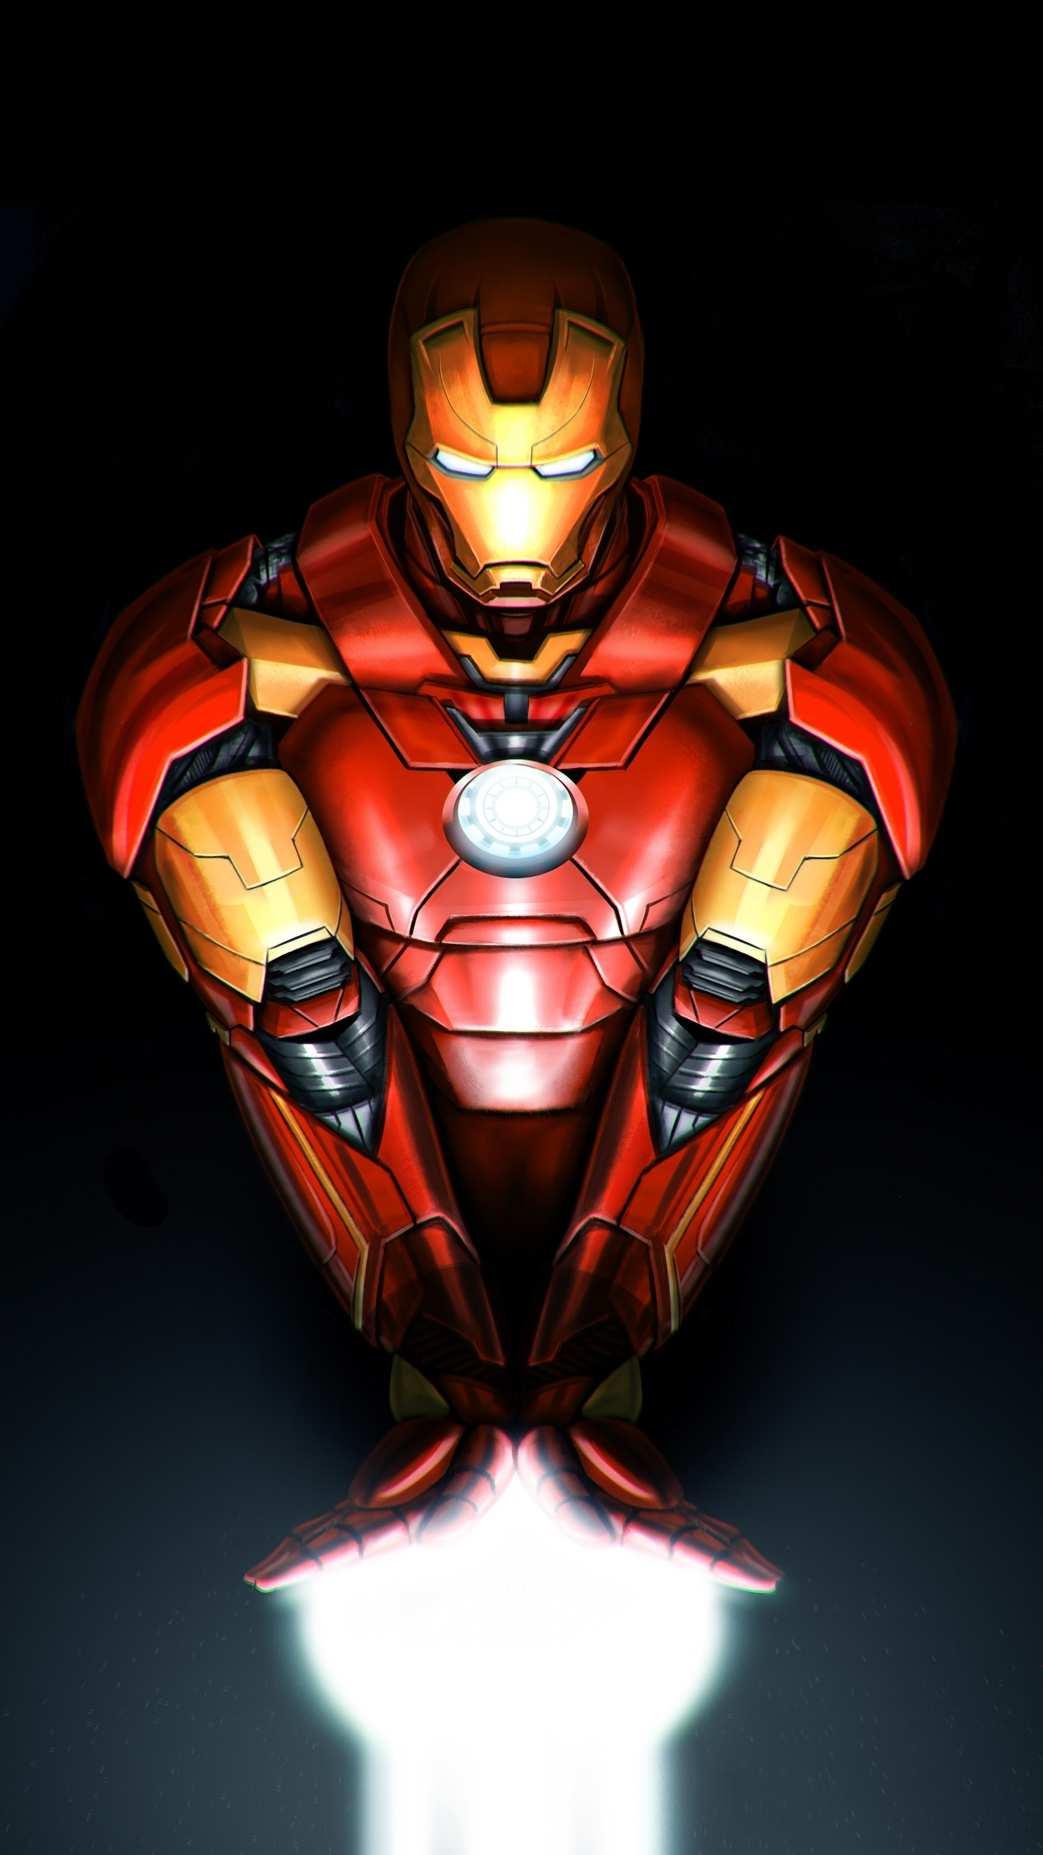 Iron Man Mark 42 iPhone Wallpaper